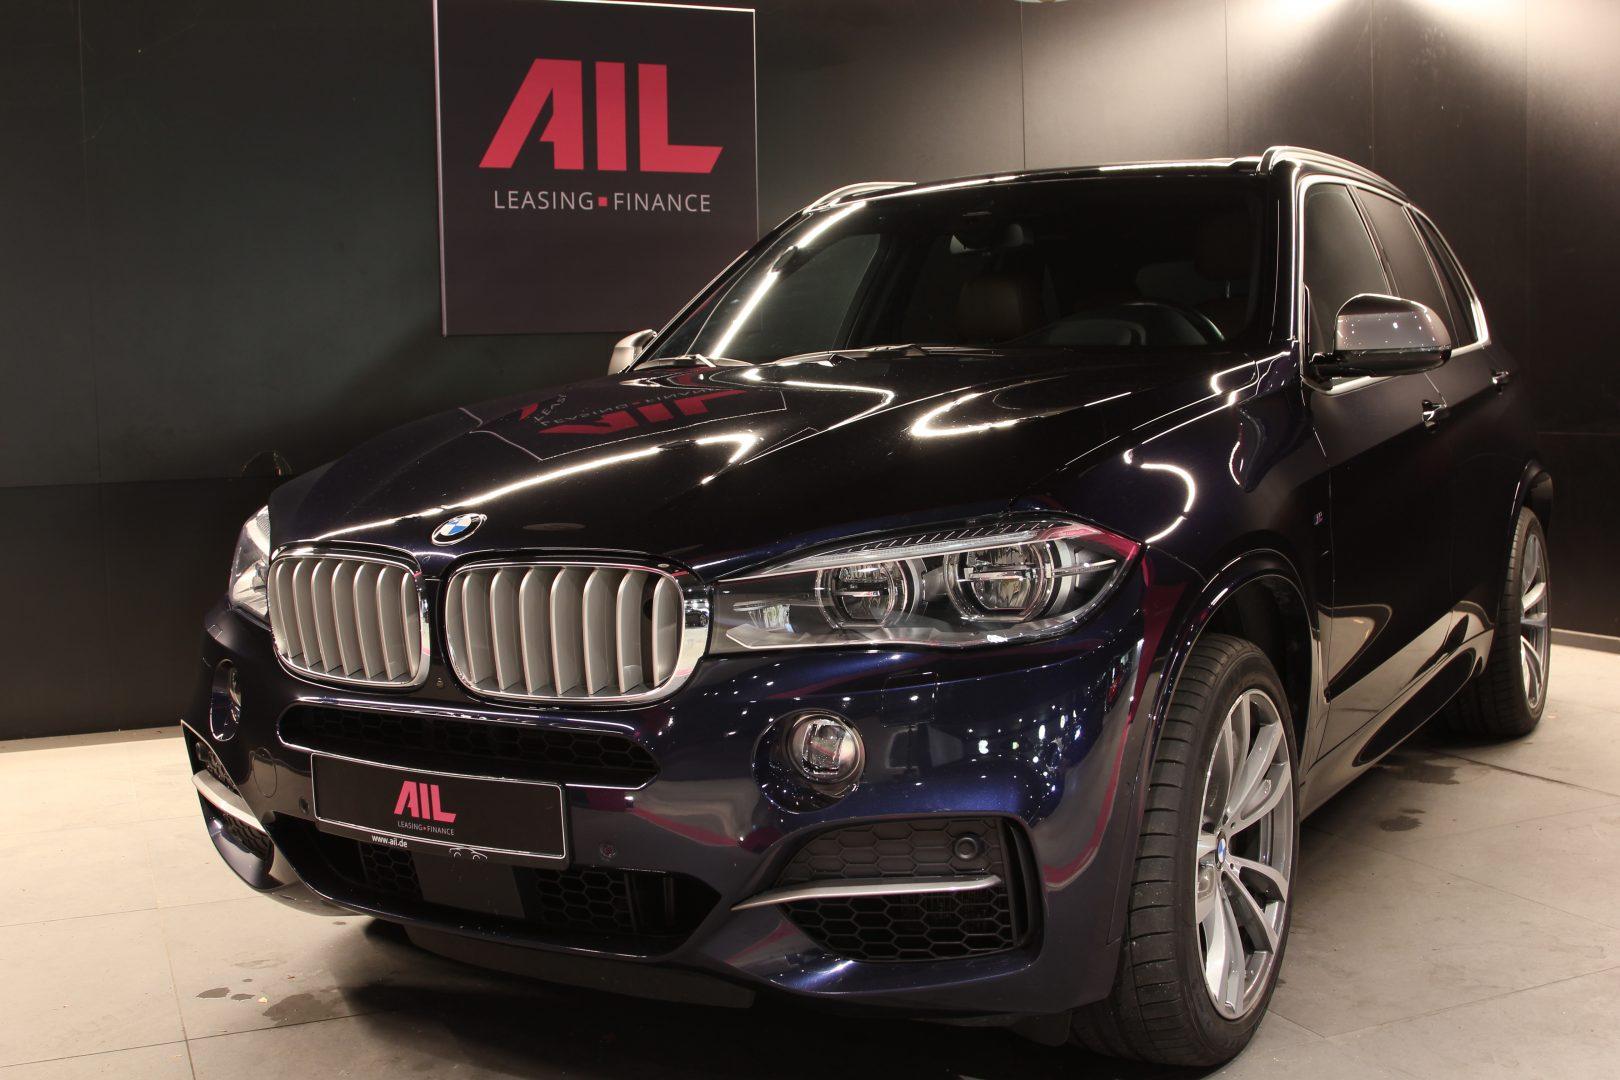 AIL BMW X5 M50d Bang & Olufsen Panorama RSE 11